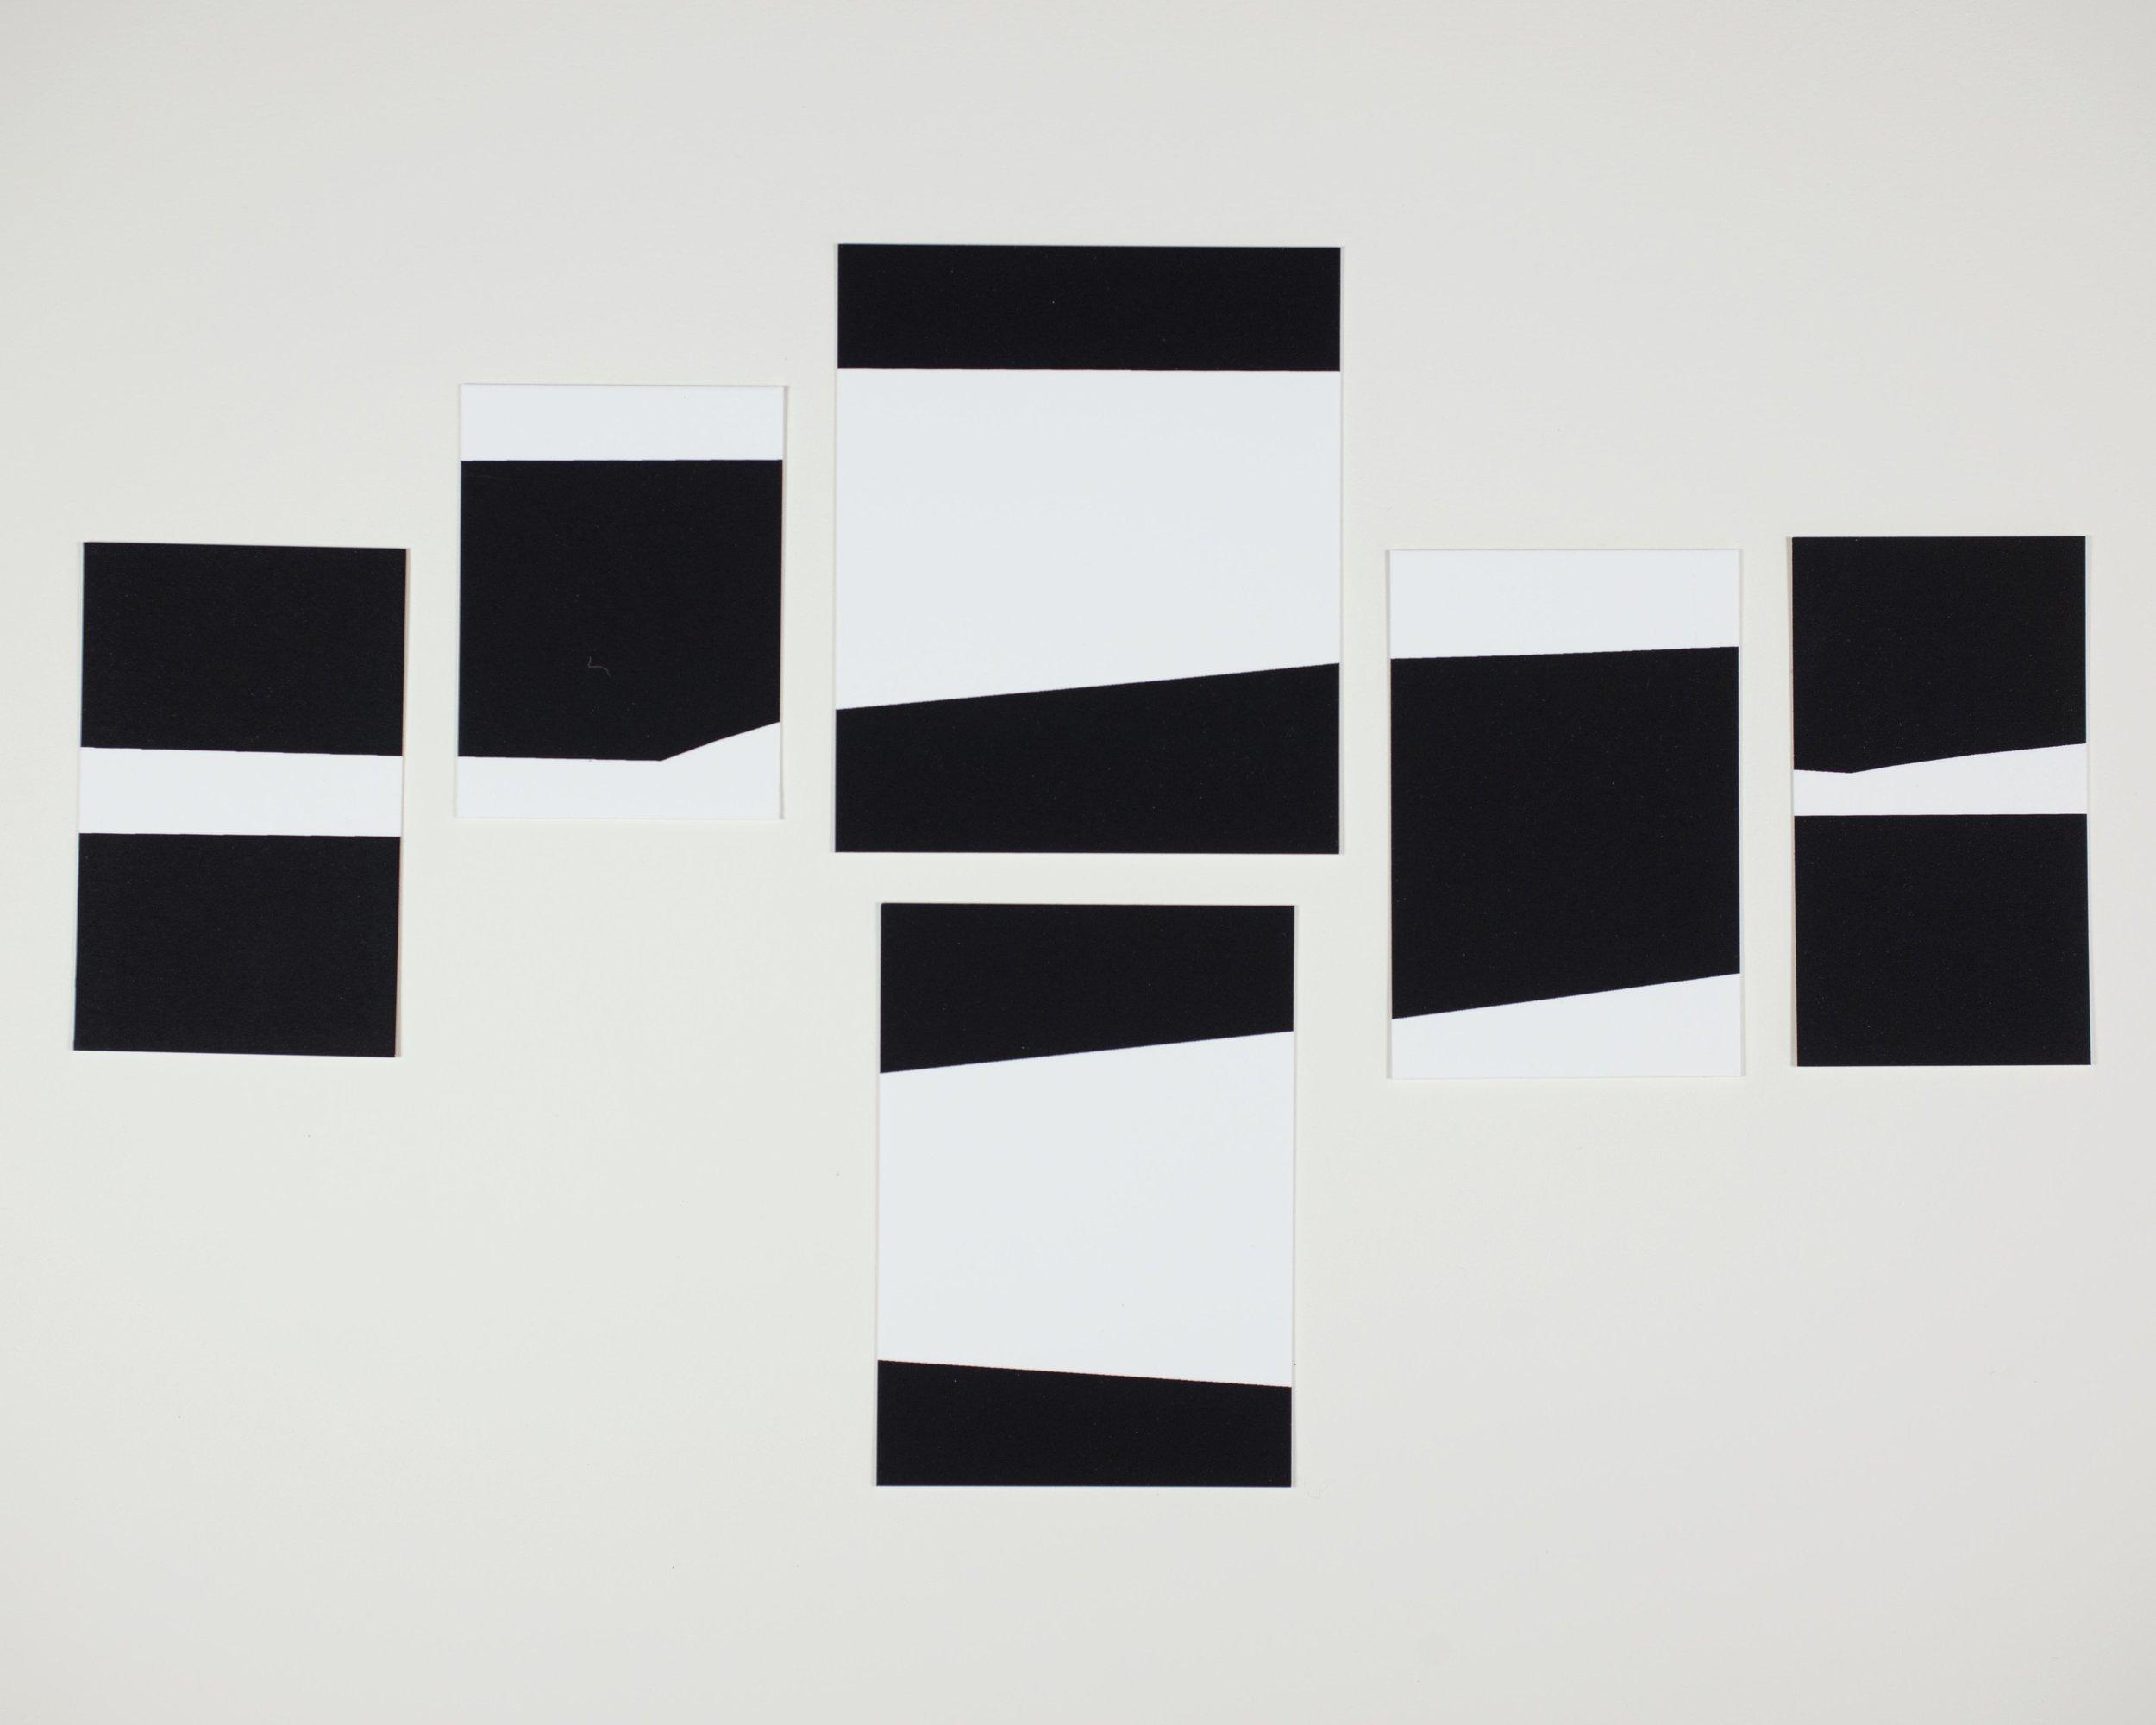 Ralph Coburn, Random Sequence, 2015